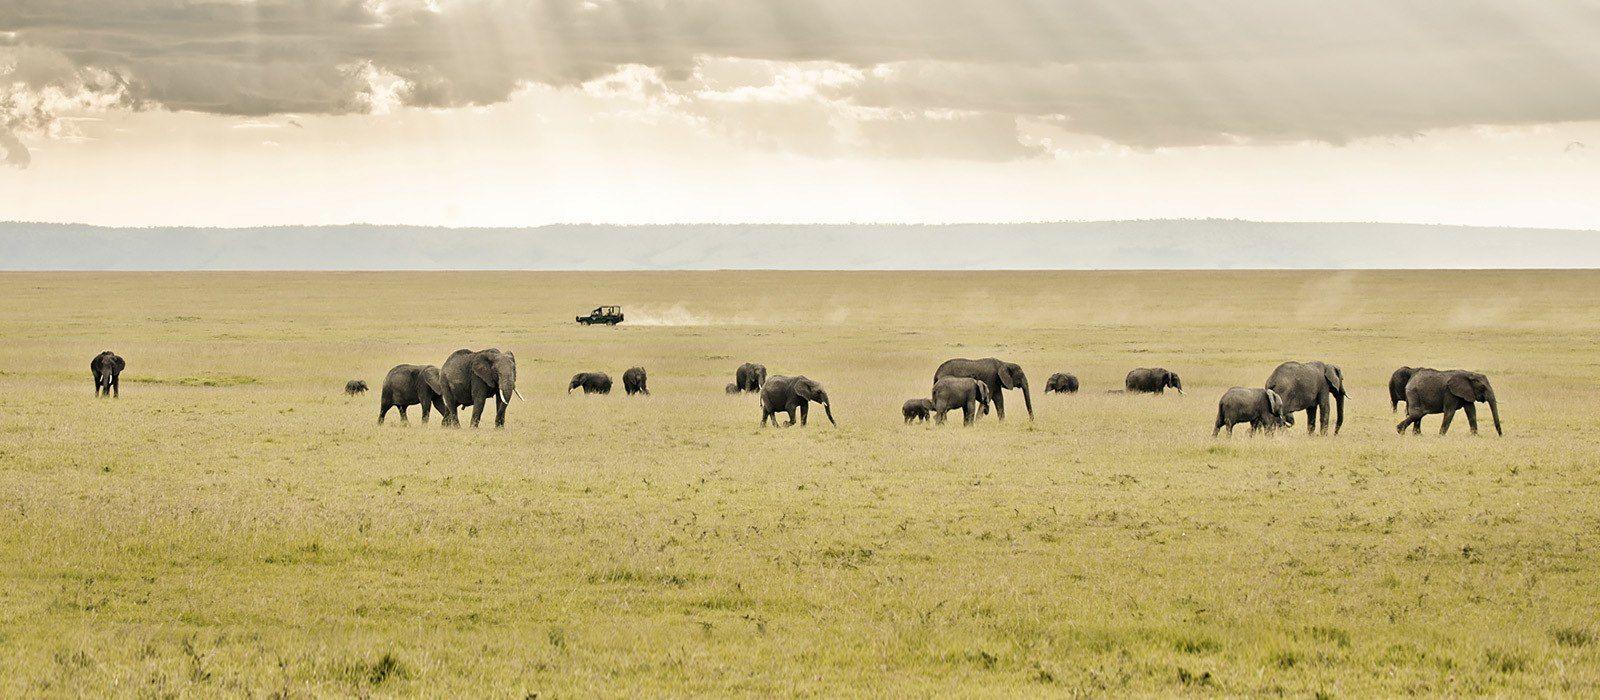 Kenia – Safari und Baden: Masai Mara & Traumstrände Urlaub 4